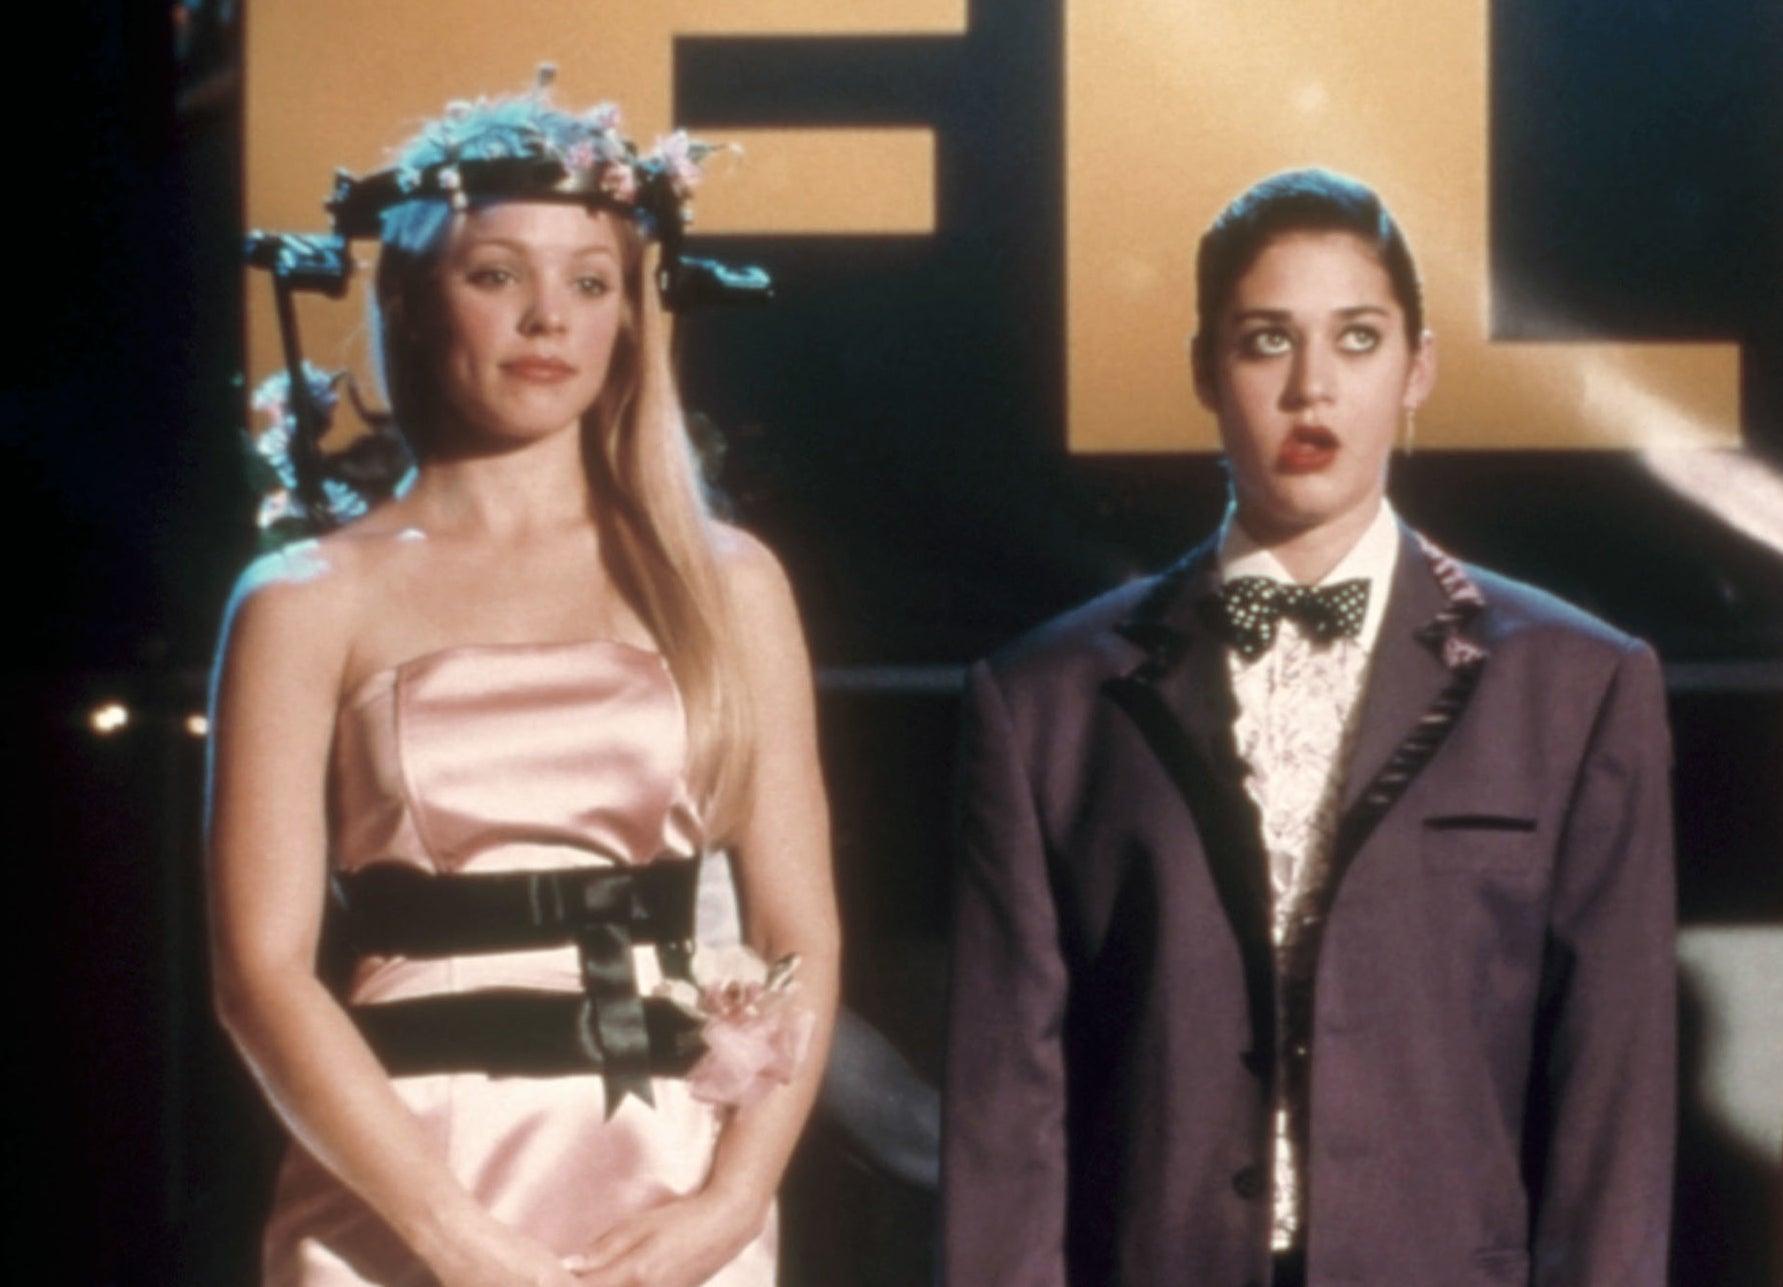 Rachel McAdams and Lizzy Caplan in the movie mean girls